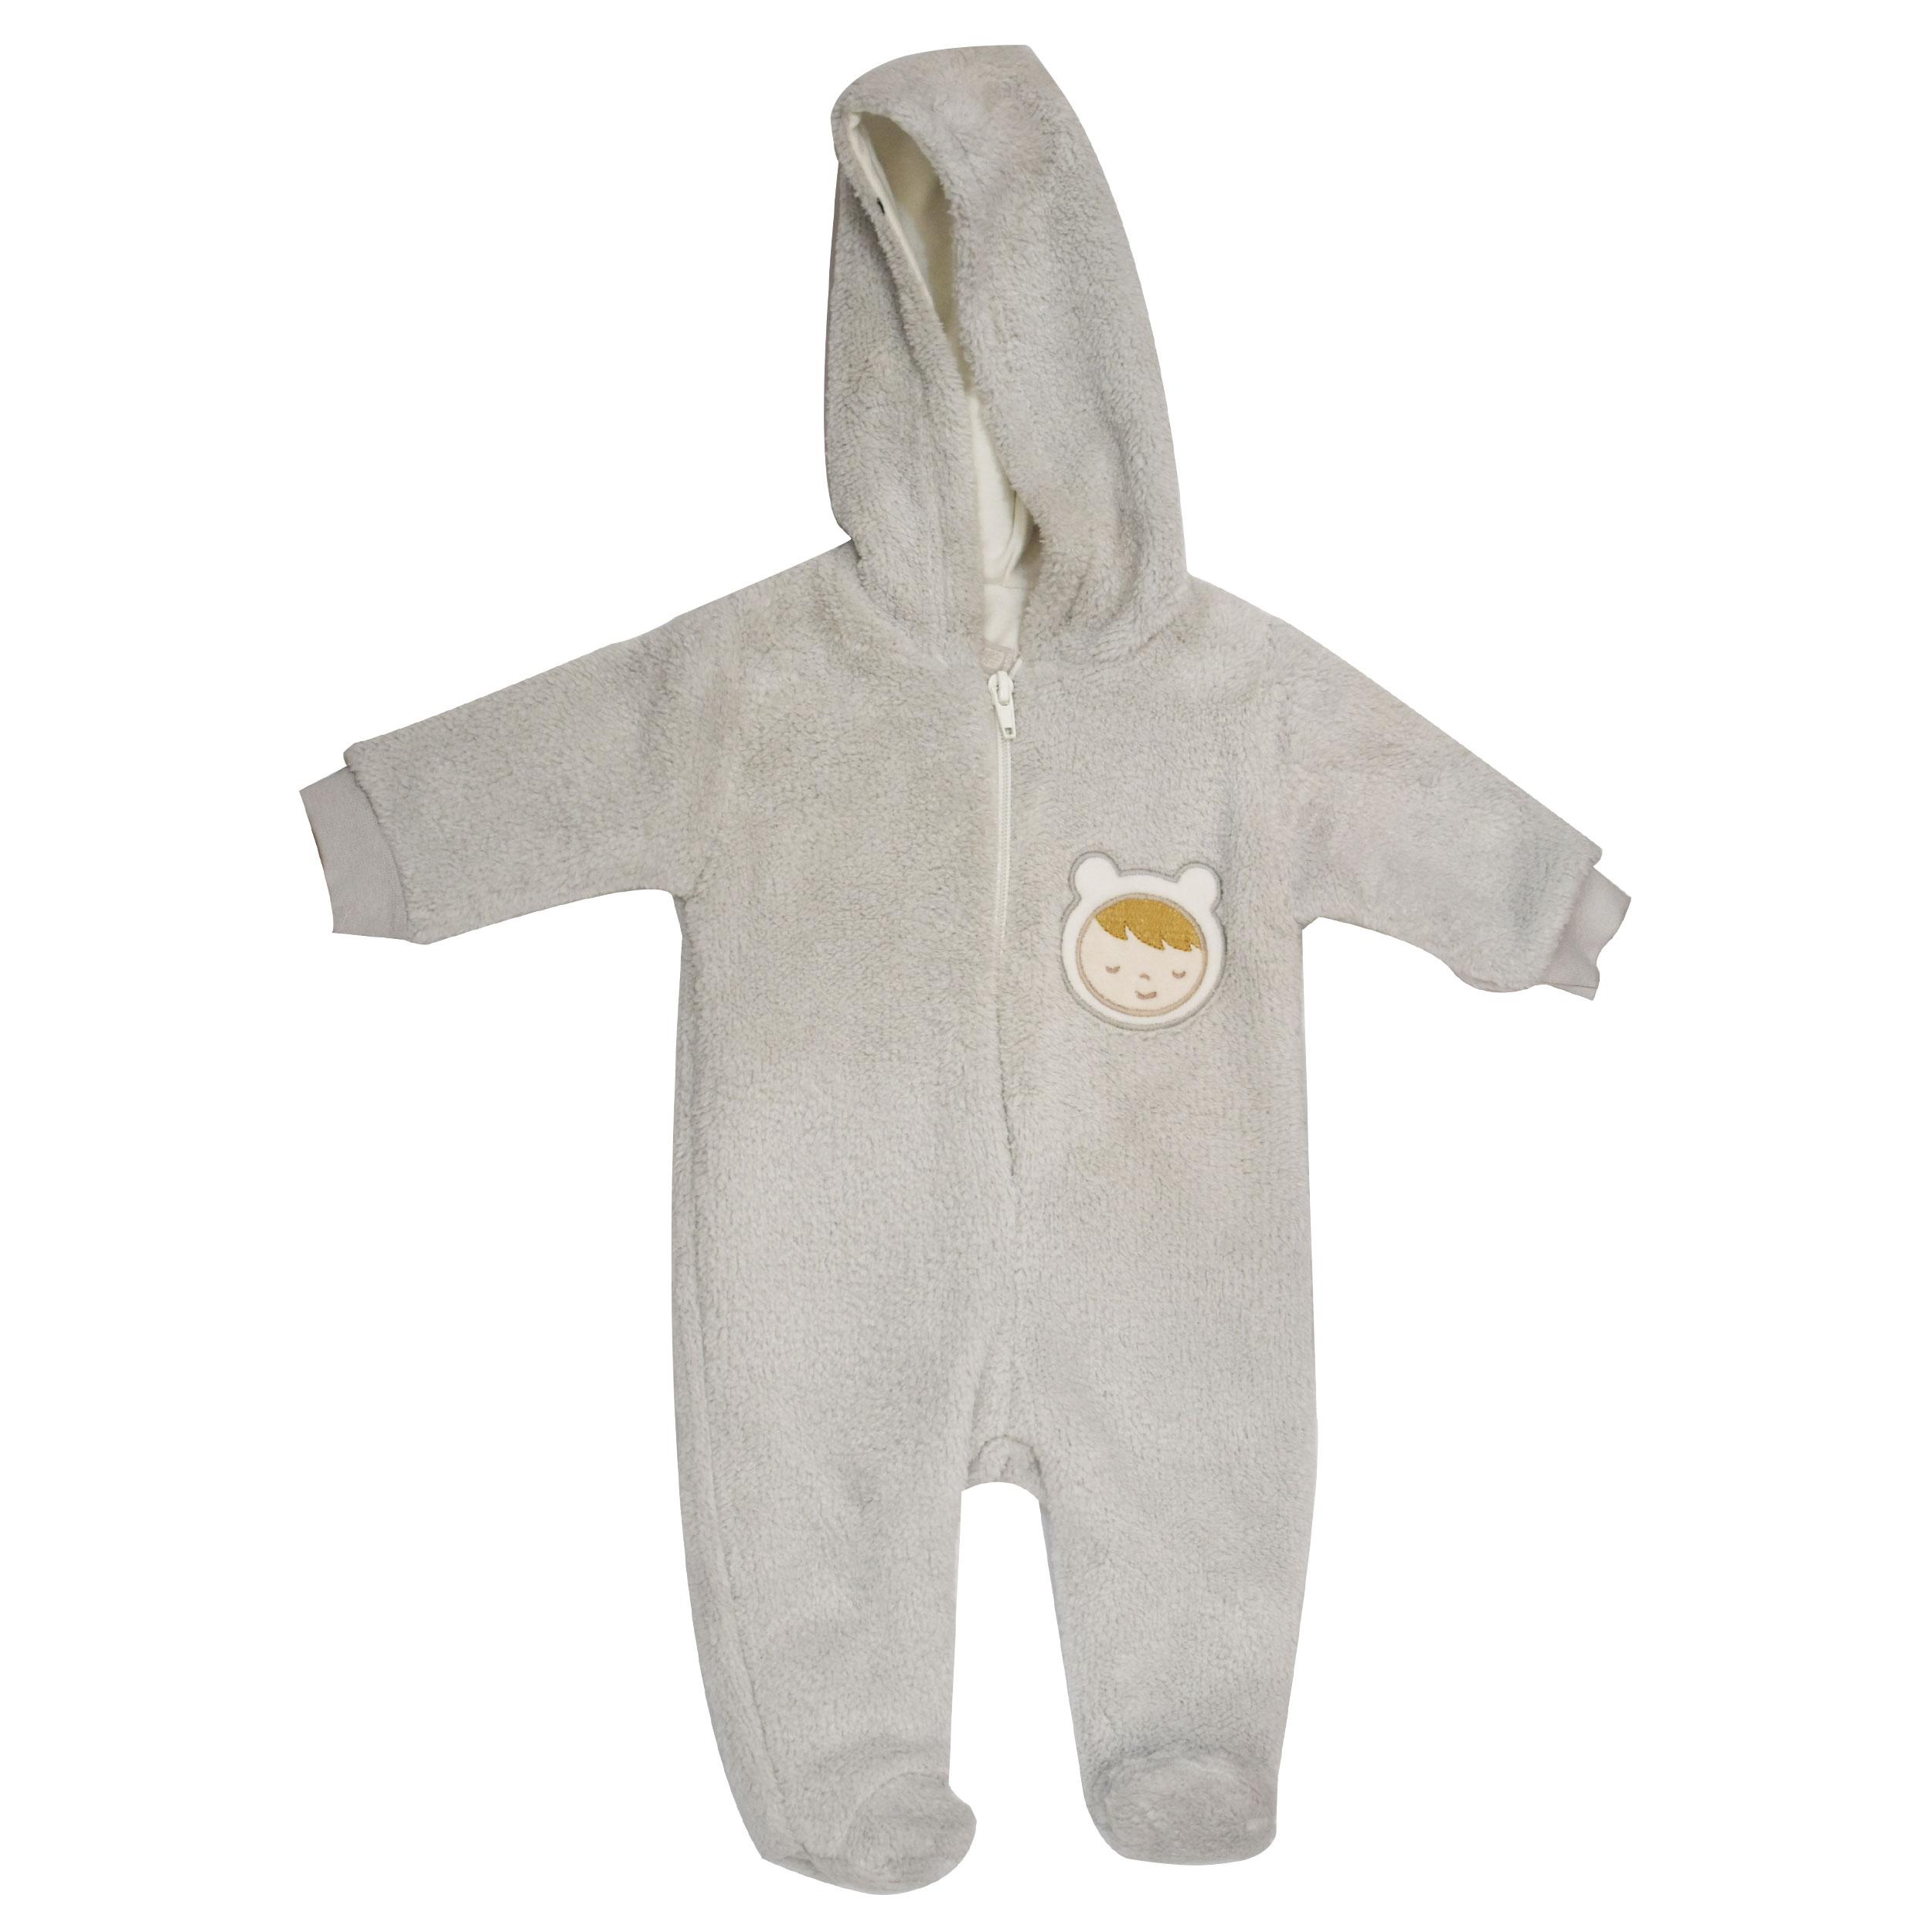 سرهمی نوزاد مدل Bip Baby کد L7822941.3